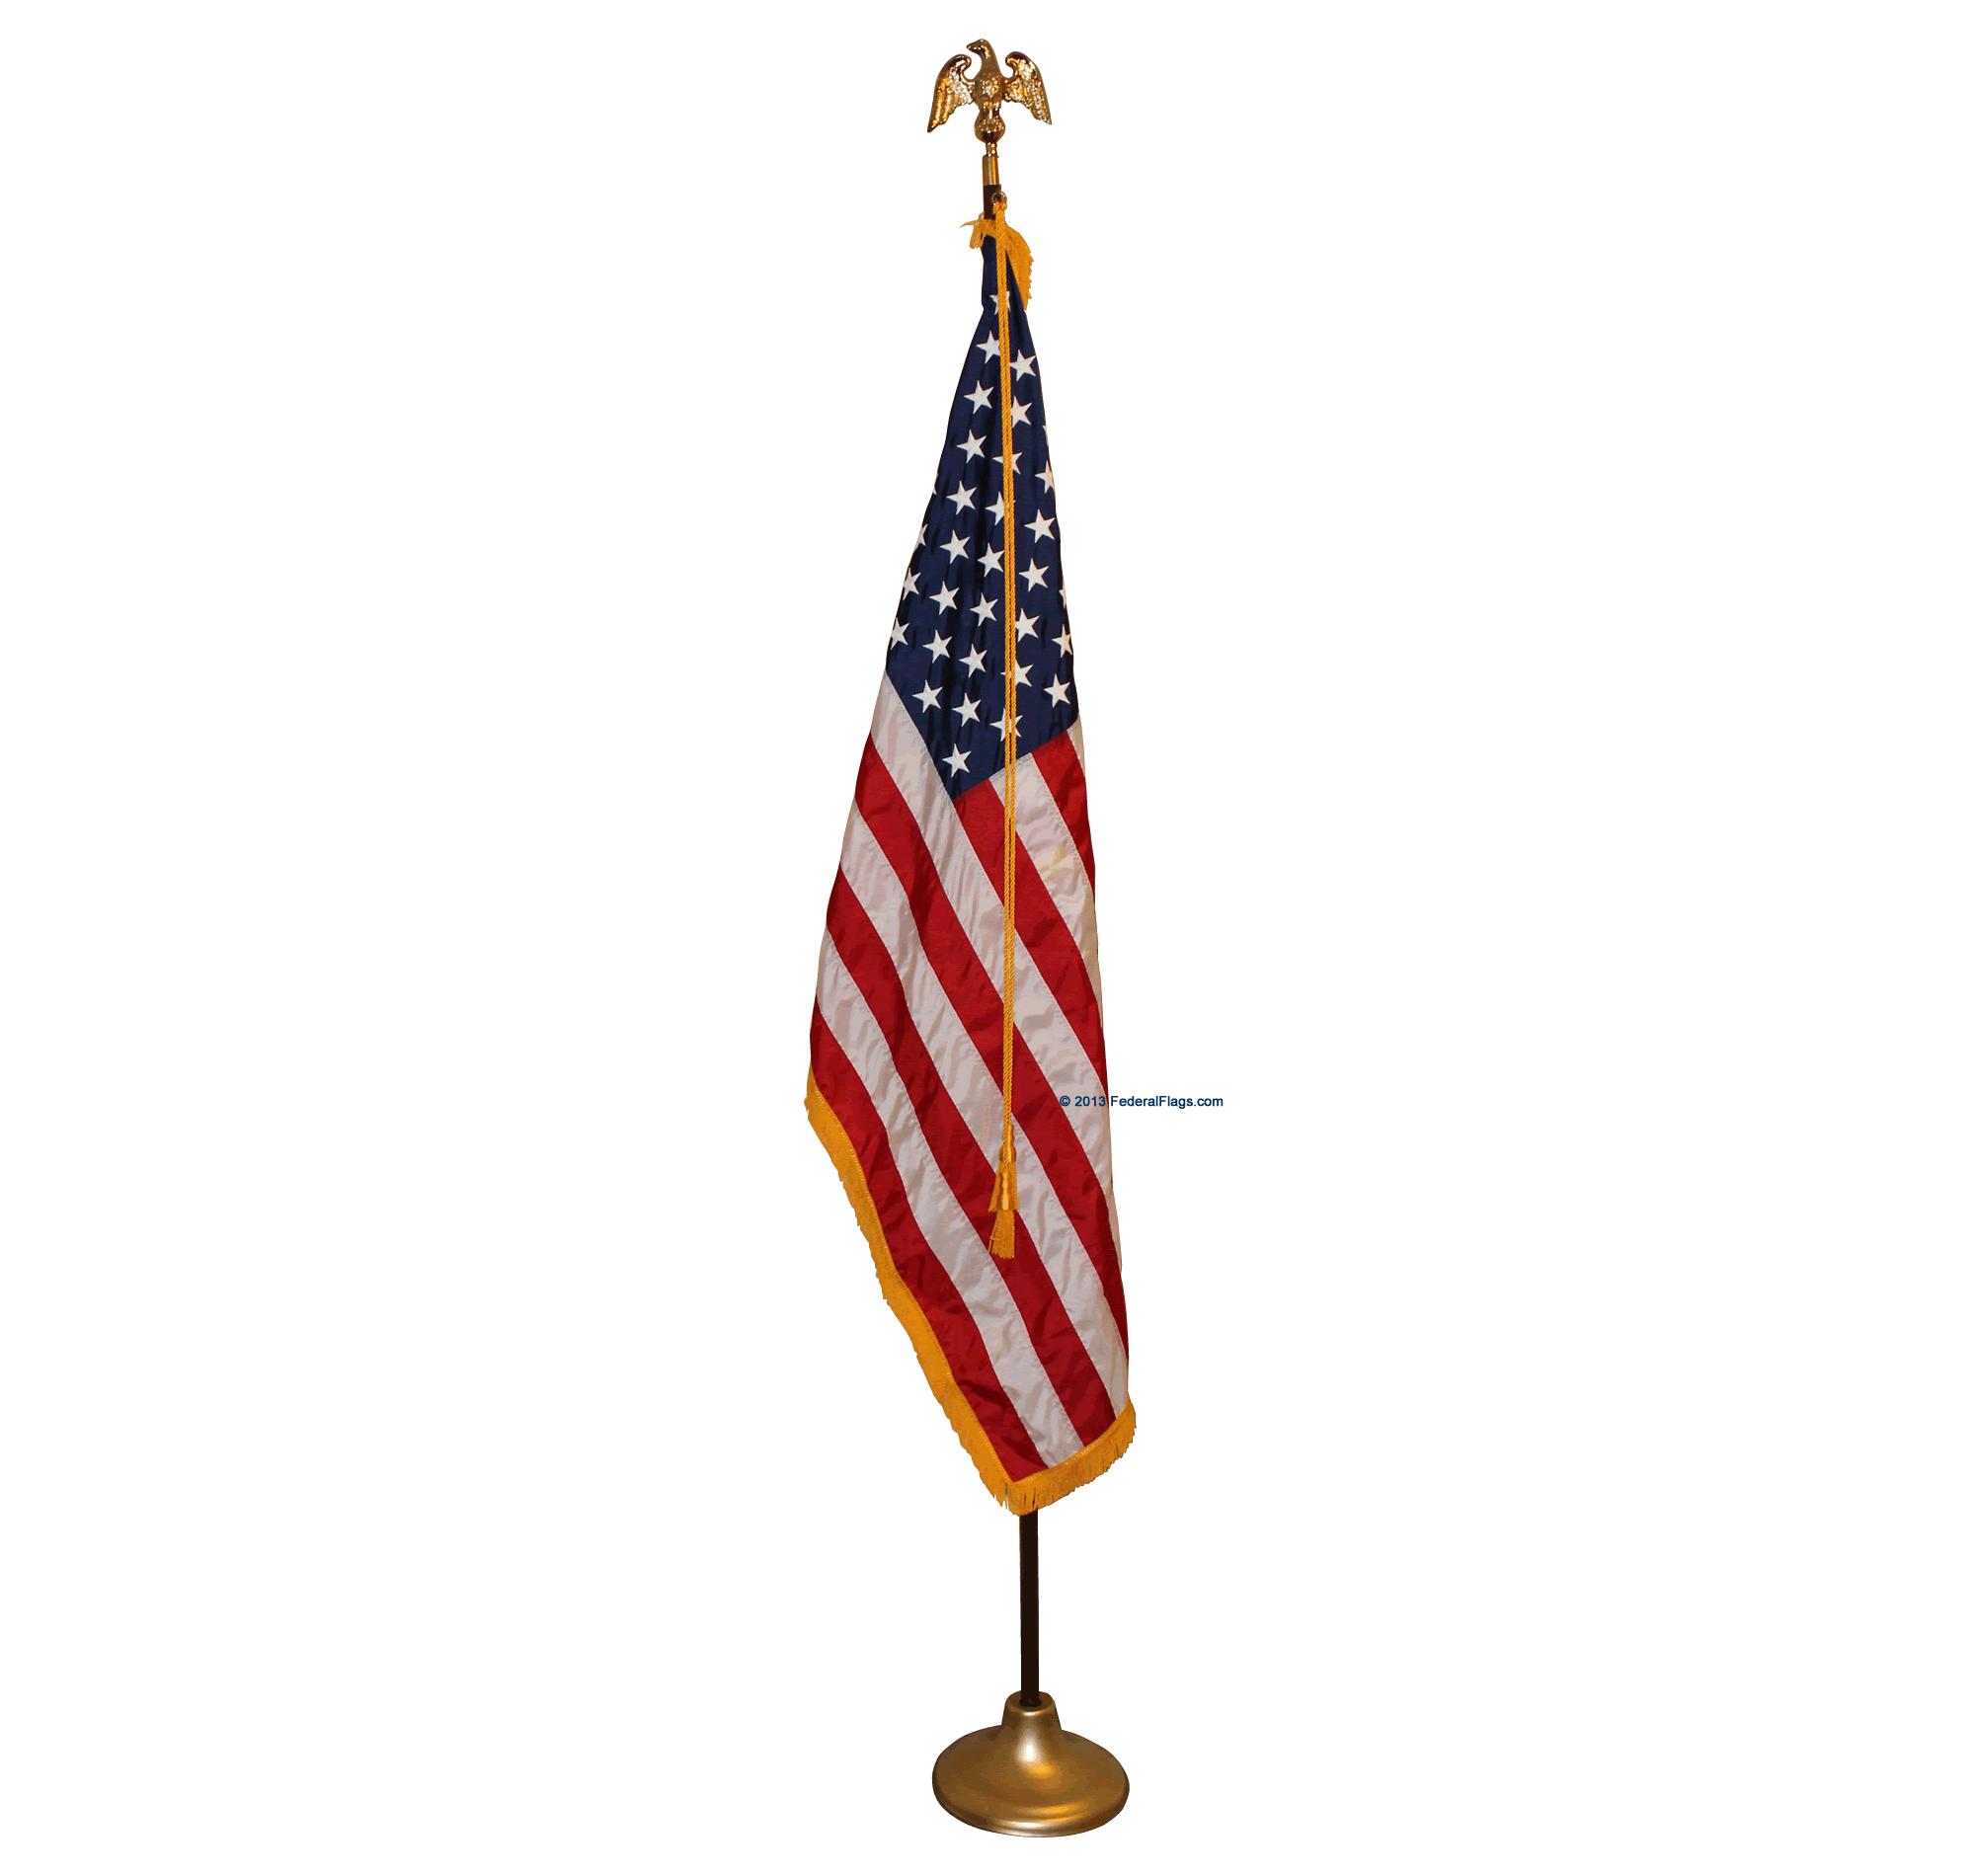 Indoor Flagpoles for Sale